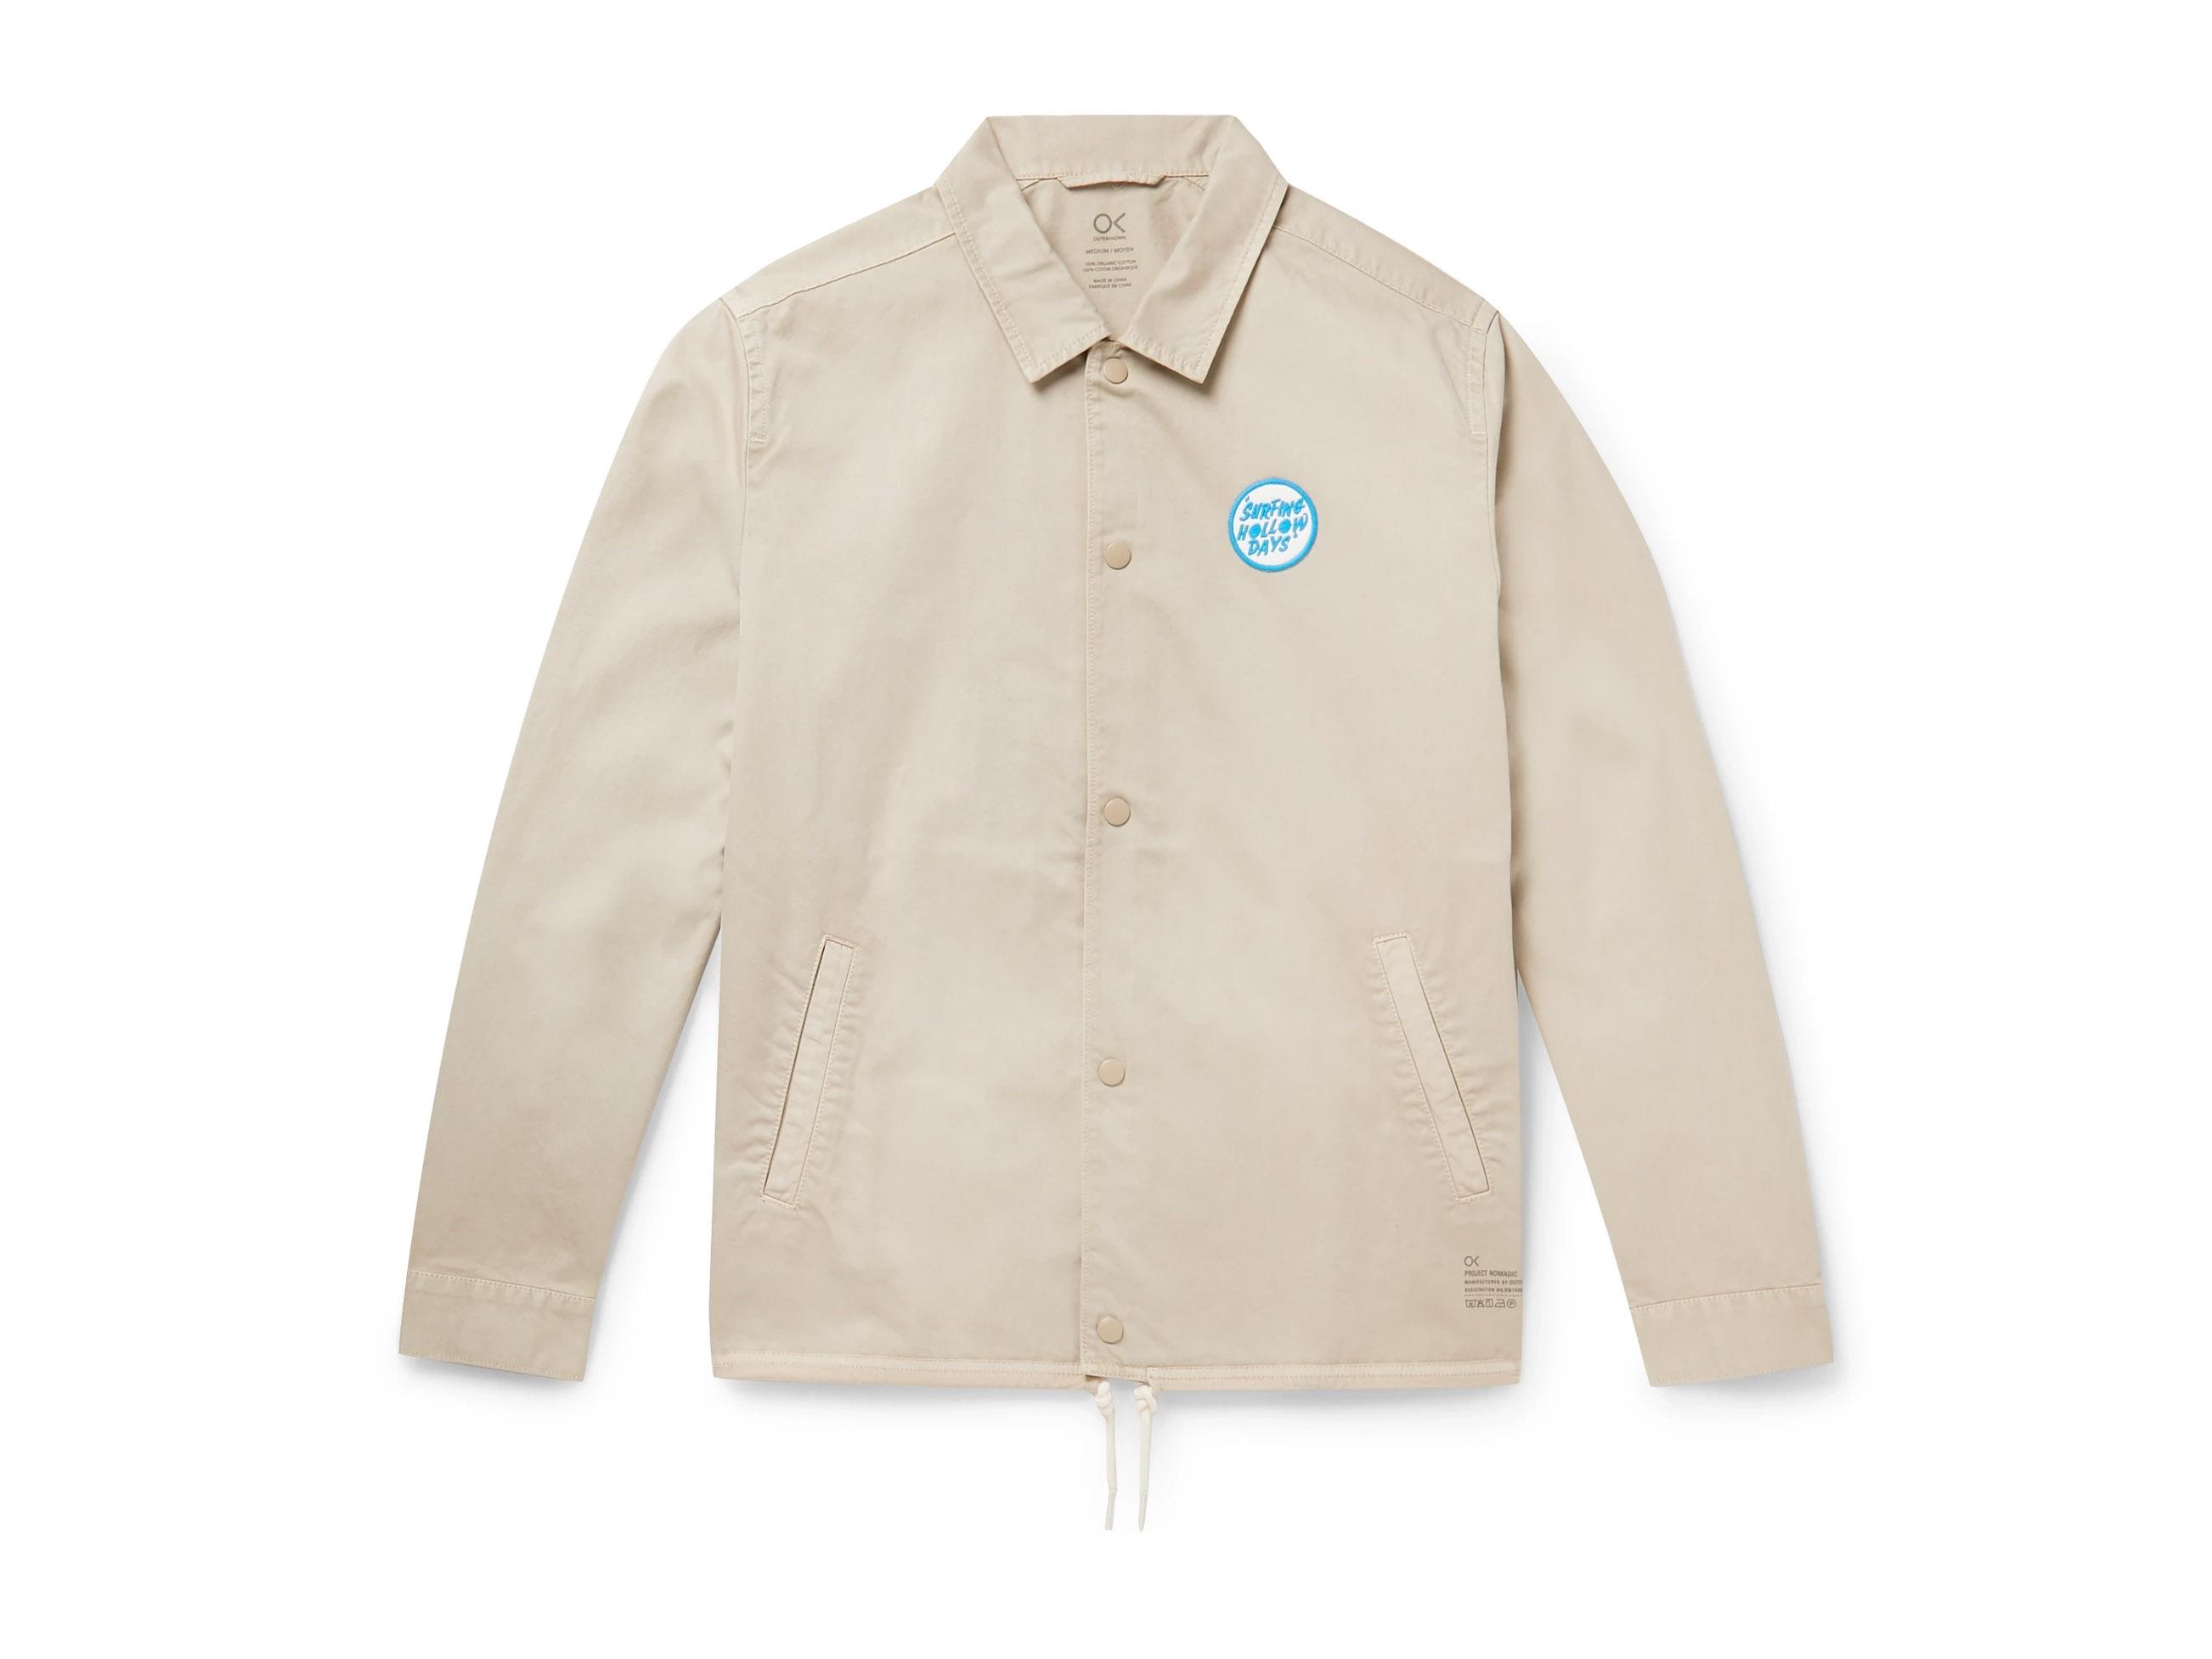 Best Fall Outerwear - Outerknown Organic Twill Men's Jacket